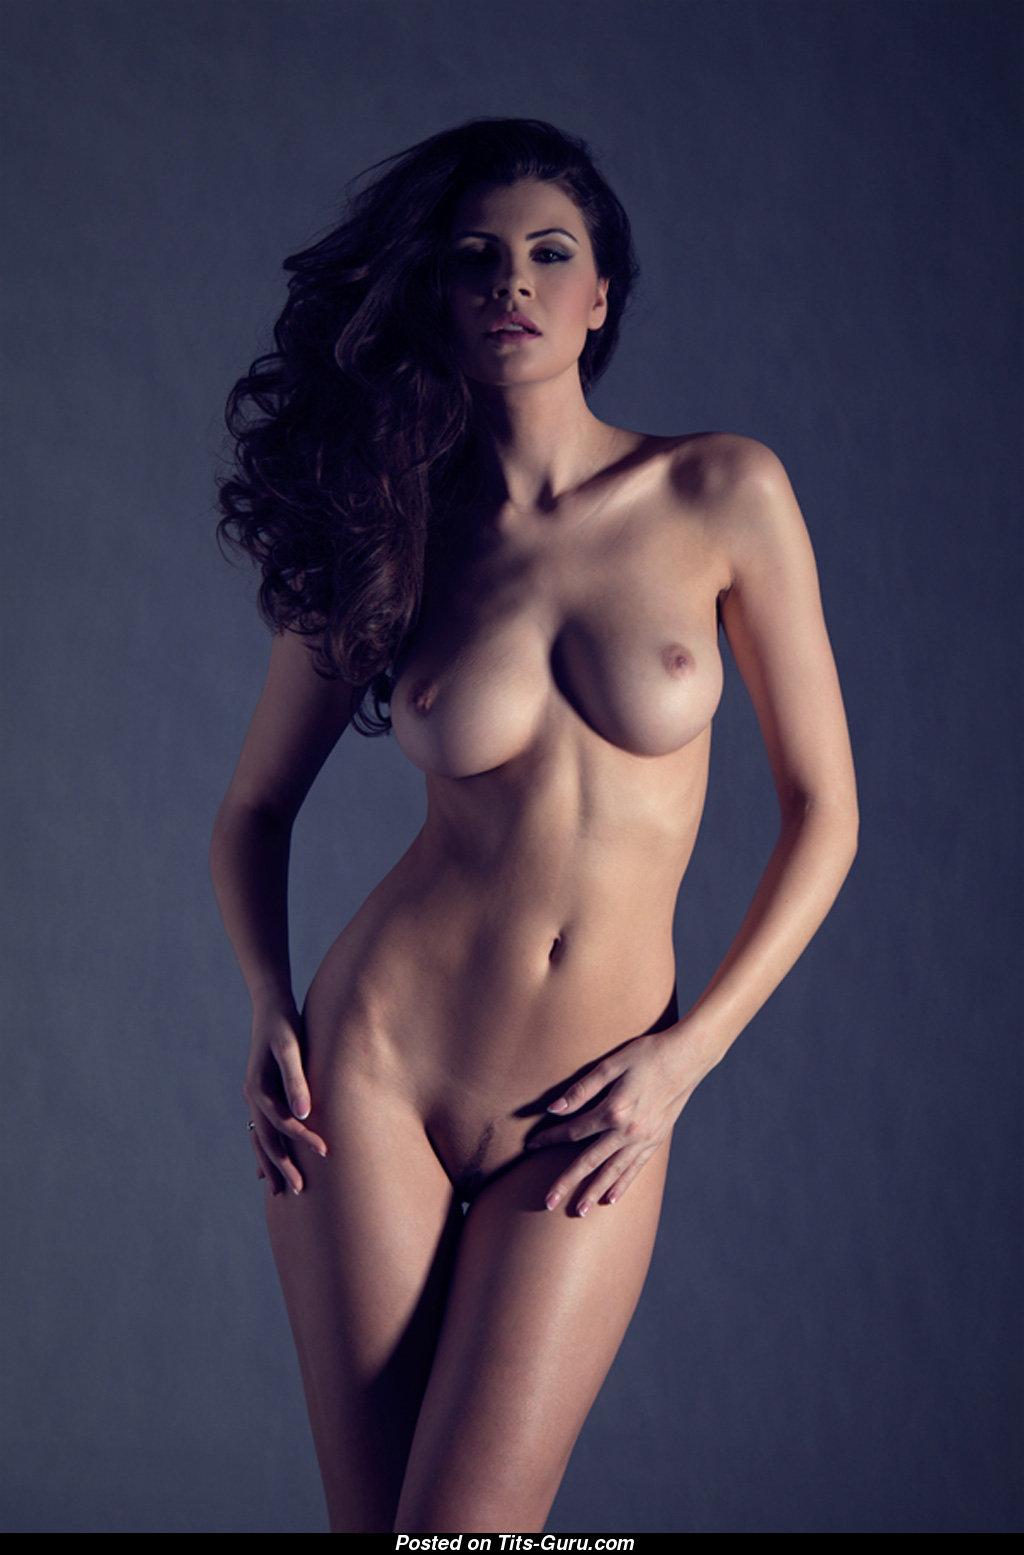 Code geass nude moments